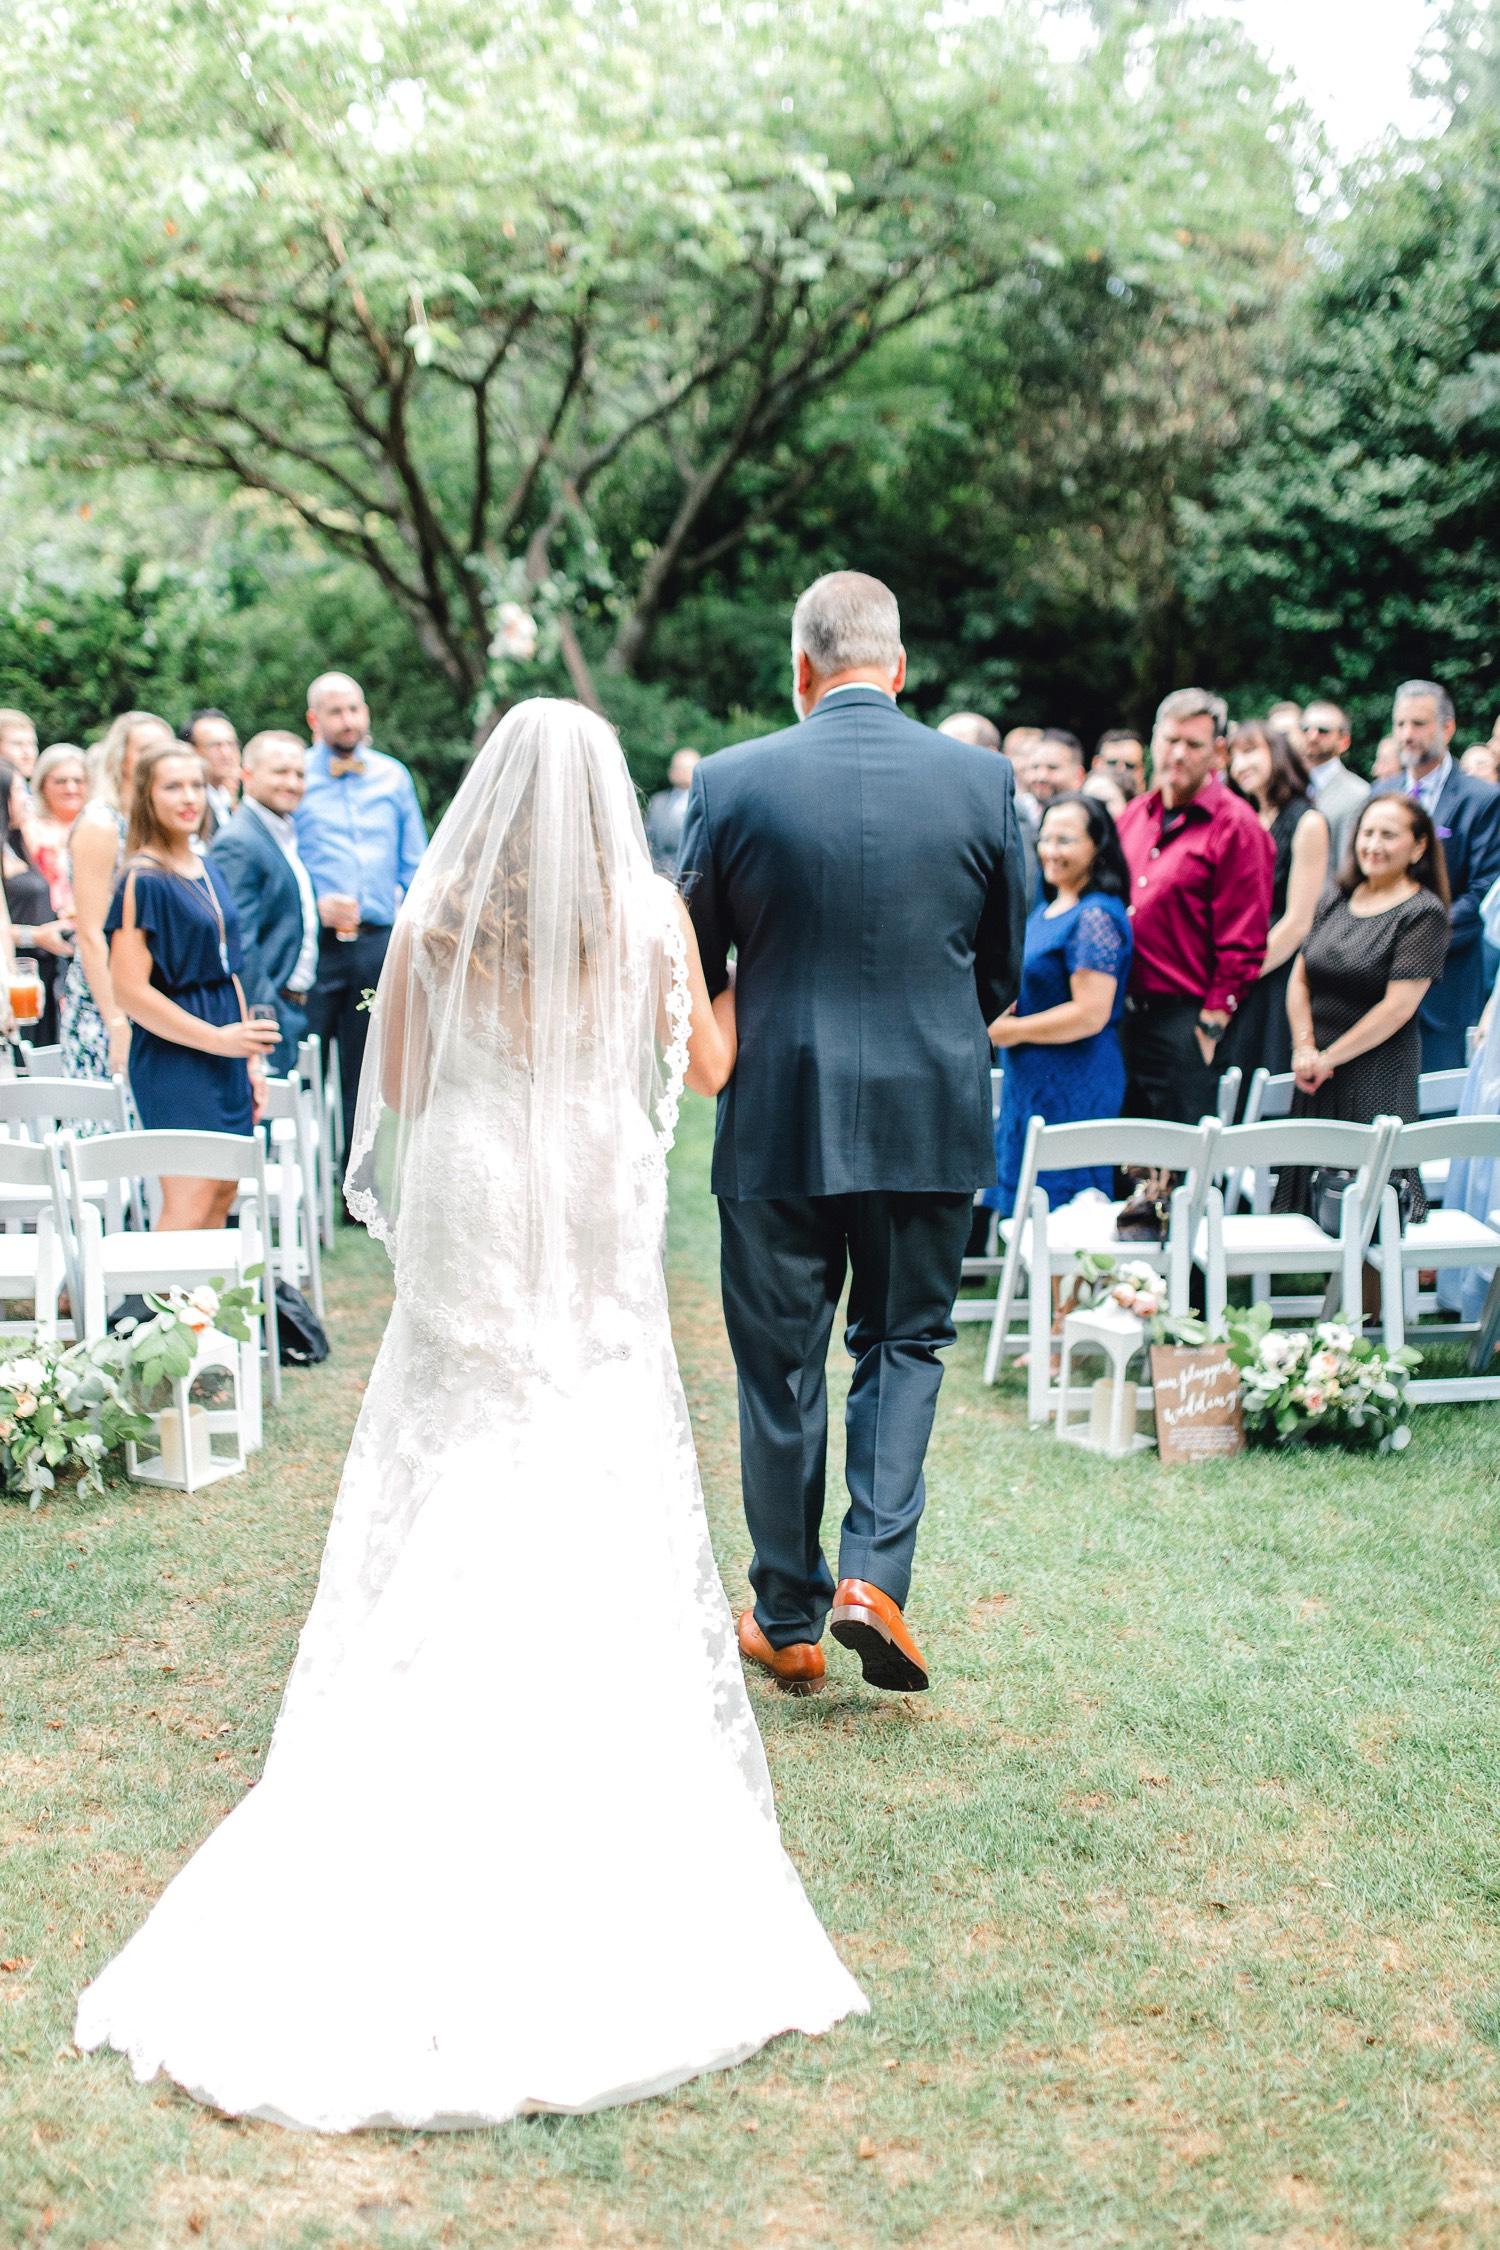 0000000000050_emmarosecompany_katiematt-3341_Photographer_PNW_House_Robinswood_Emma_Light_Company_Airy_Rose_and_Wedding_Seattle.jpg